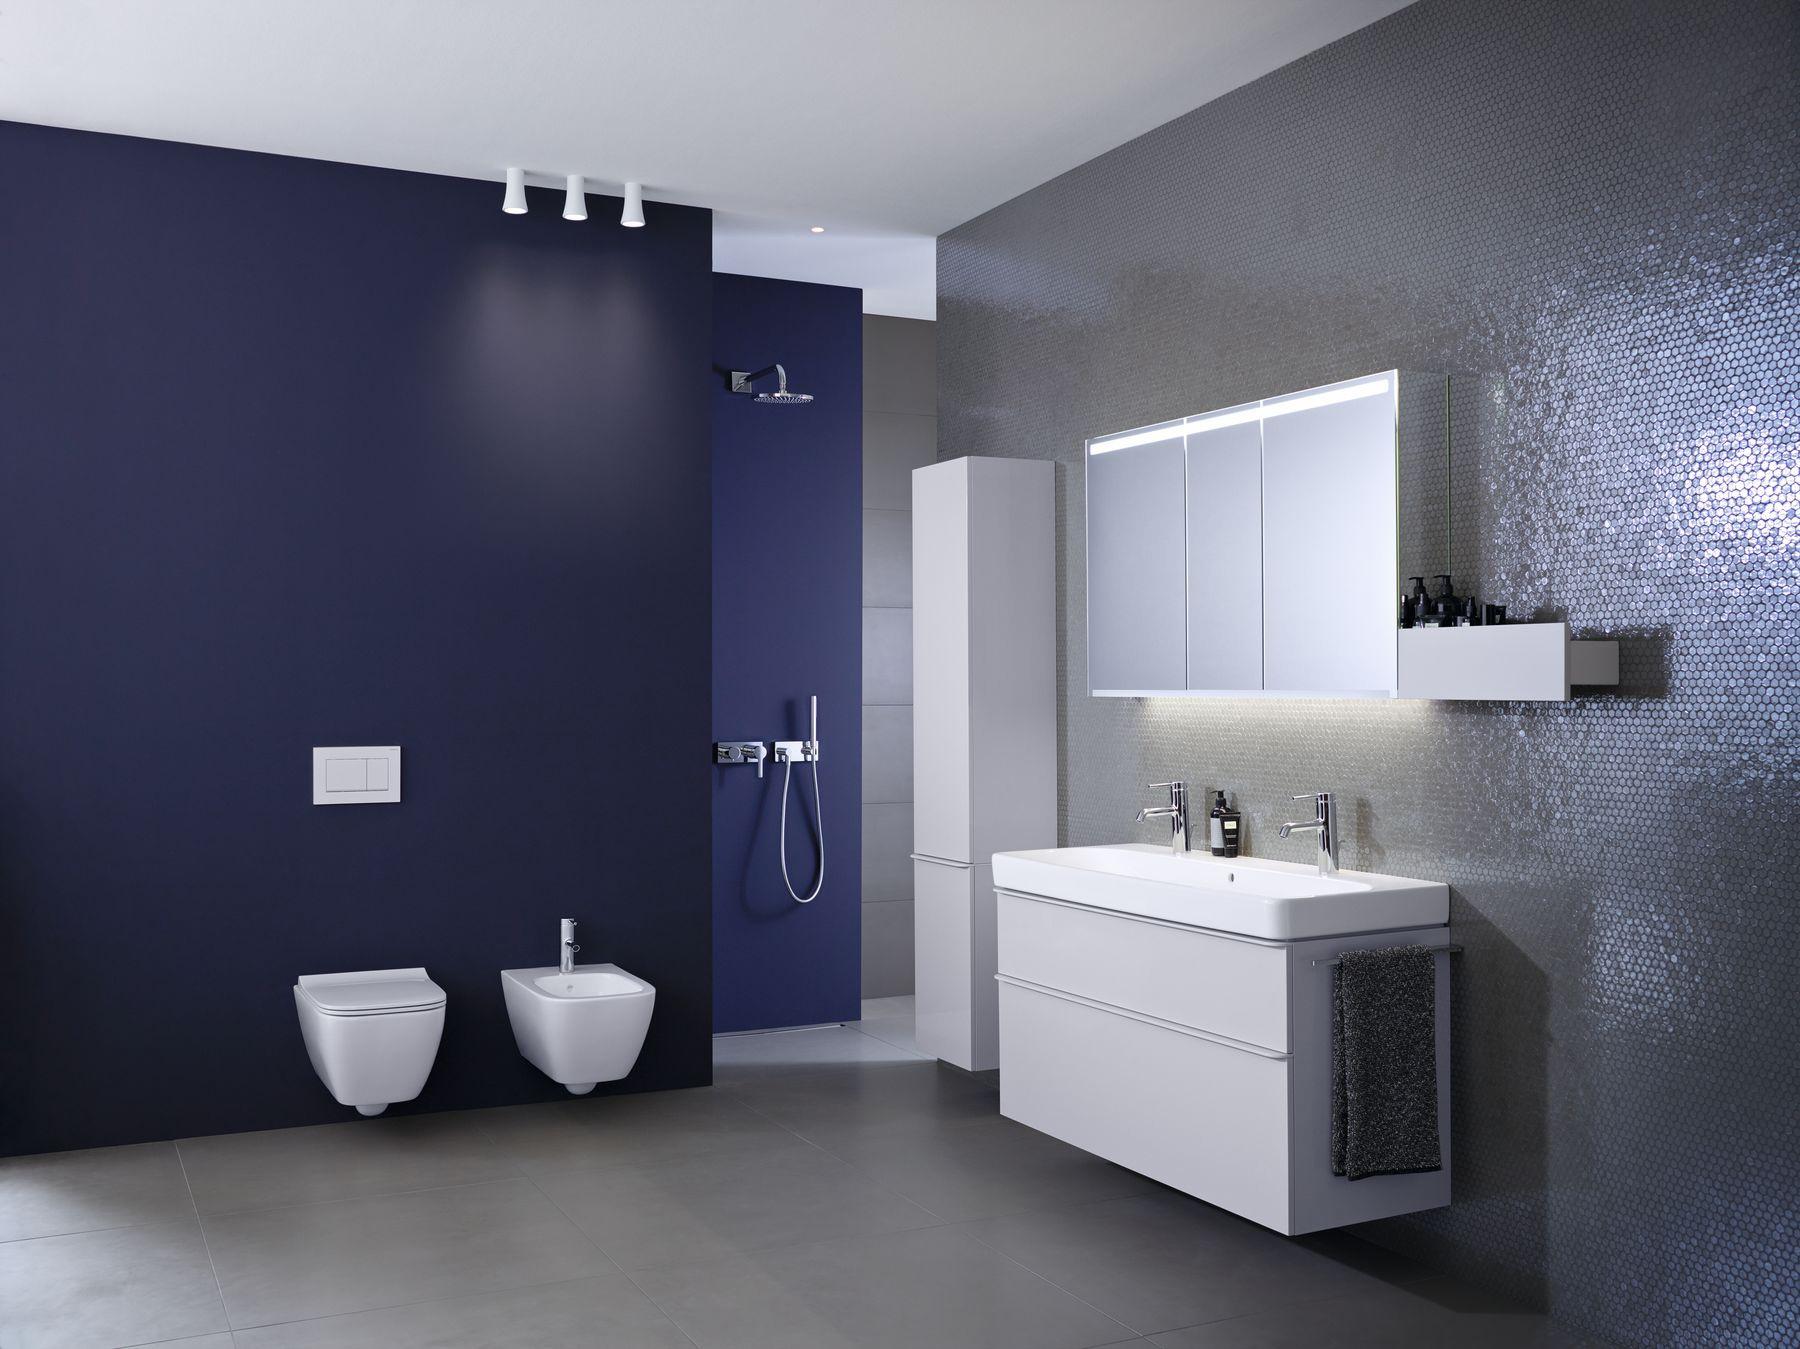 Bathroom 07 A Geberit Smyle_2216809